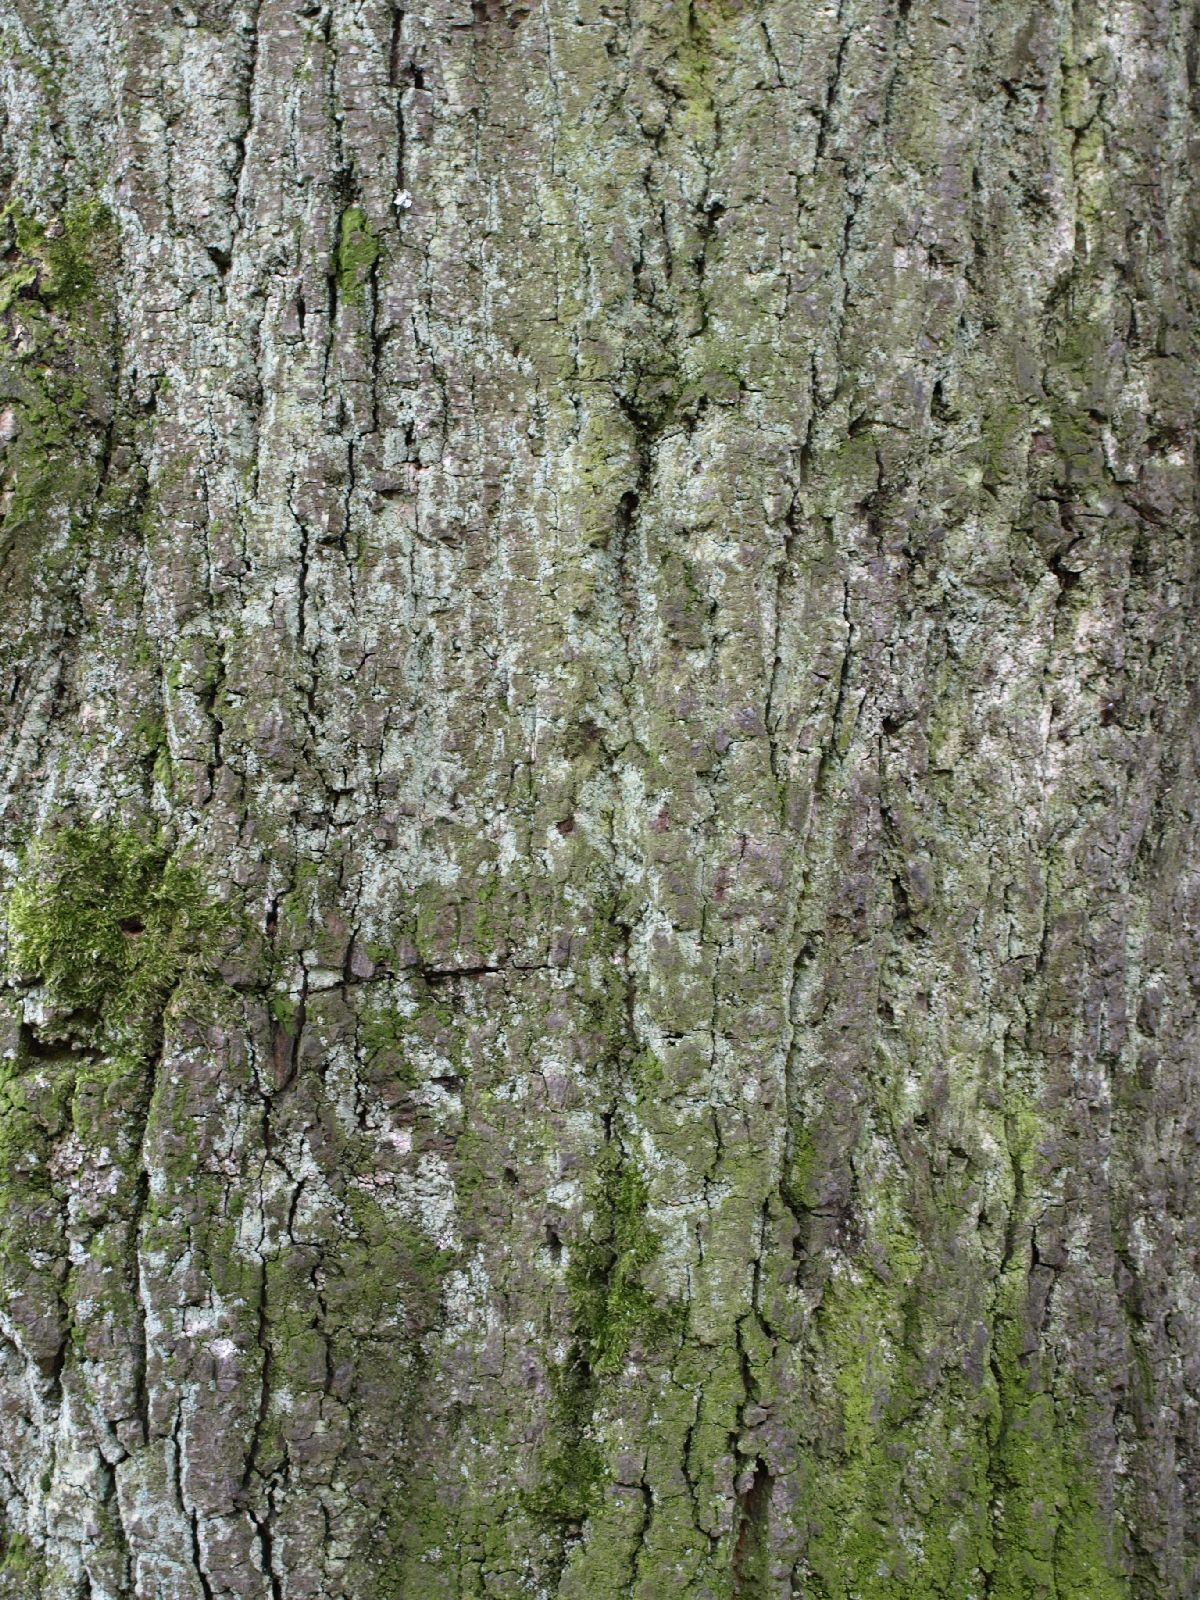 Baum-Rinde_Textur_A_P4120998